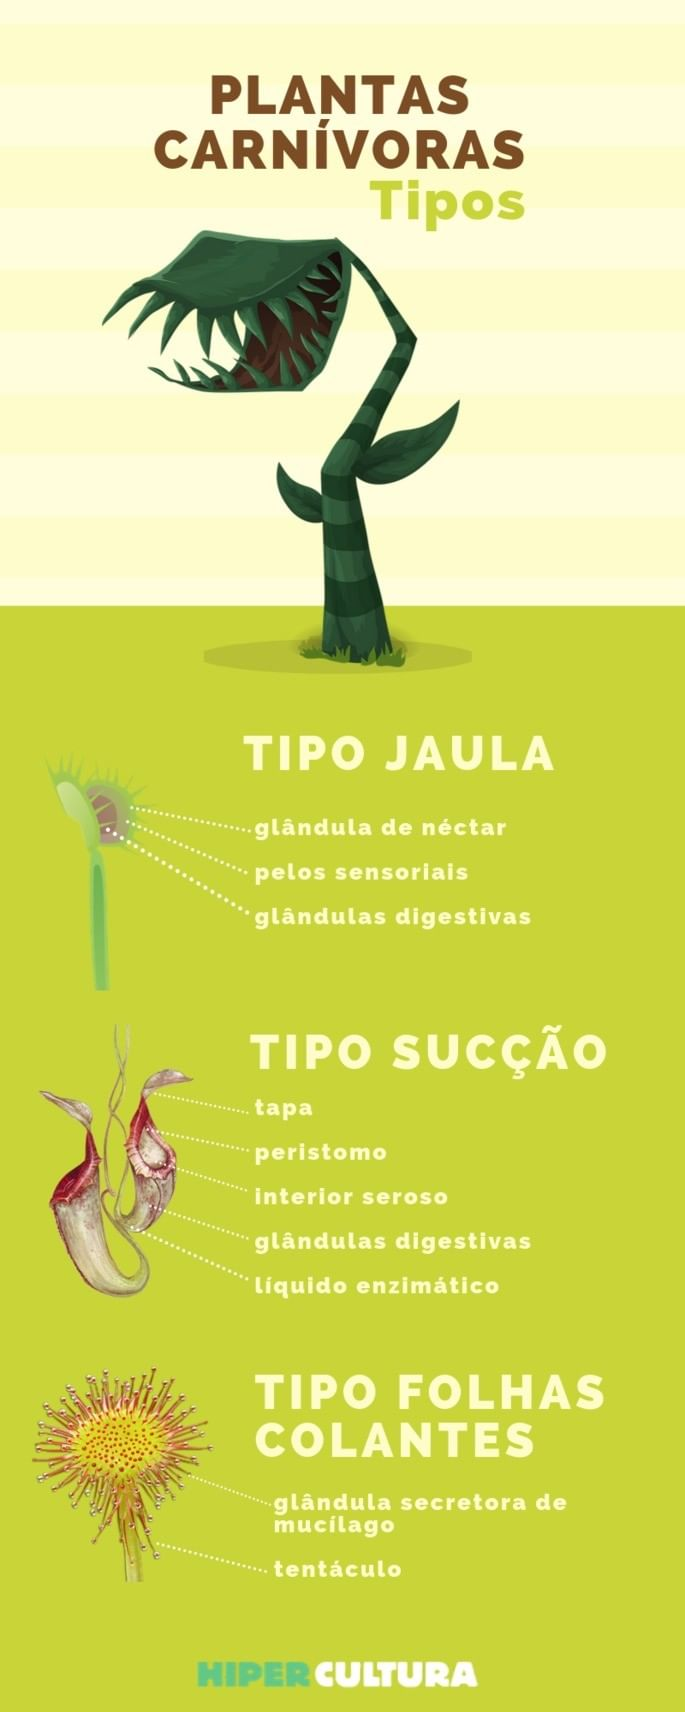 hipercultura-plantas-carnivoras-infografico